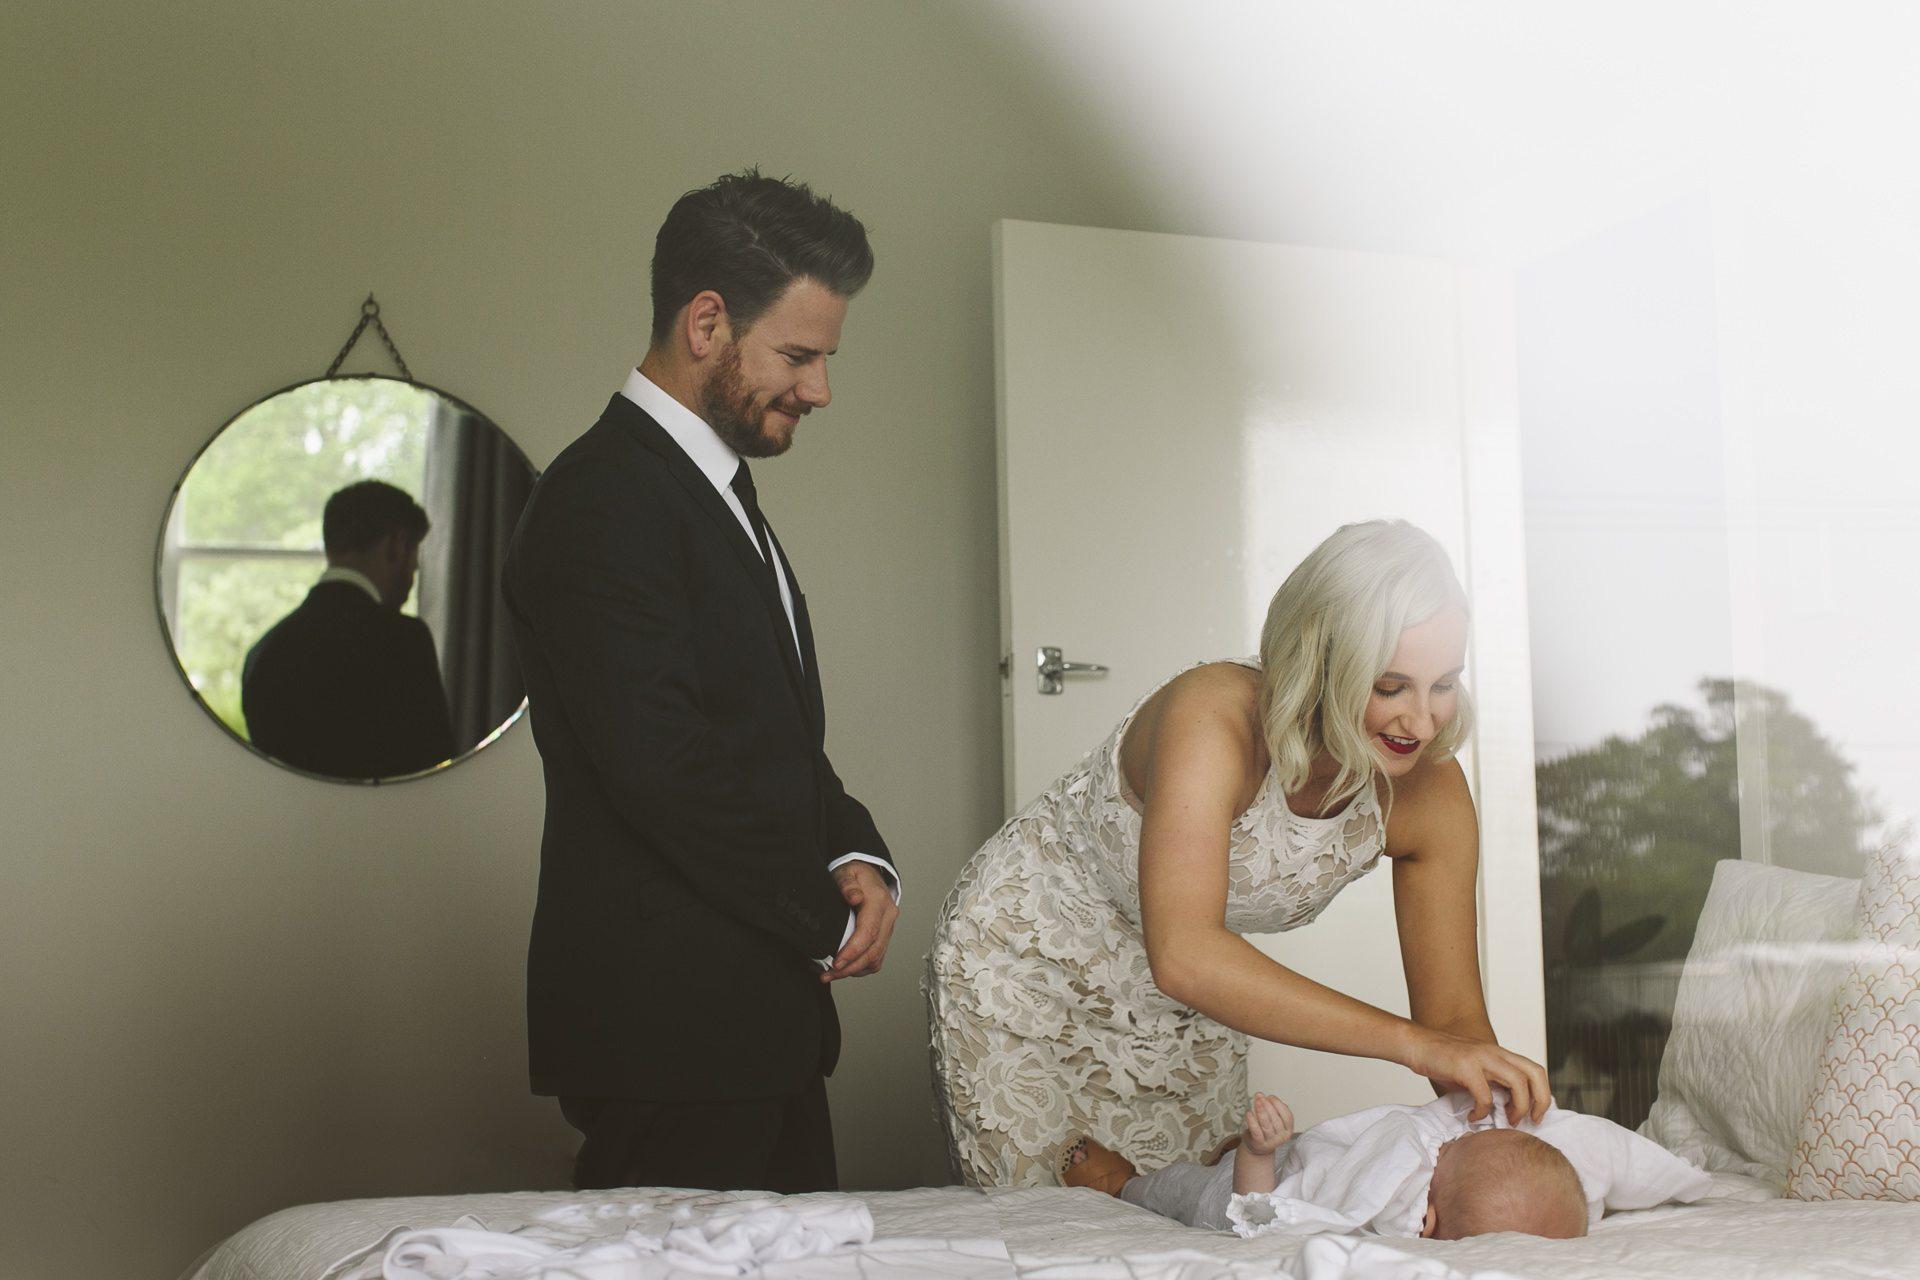 hamilton-wedding-portrait-photographer-at-110